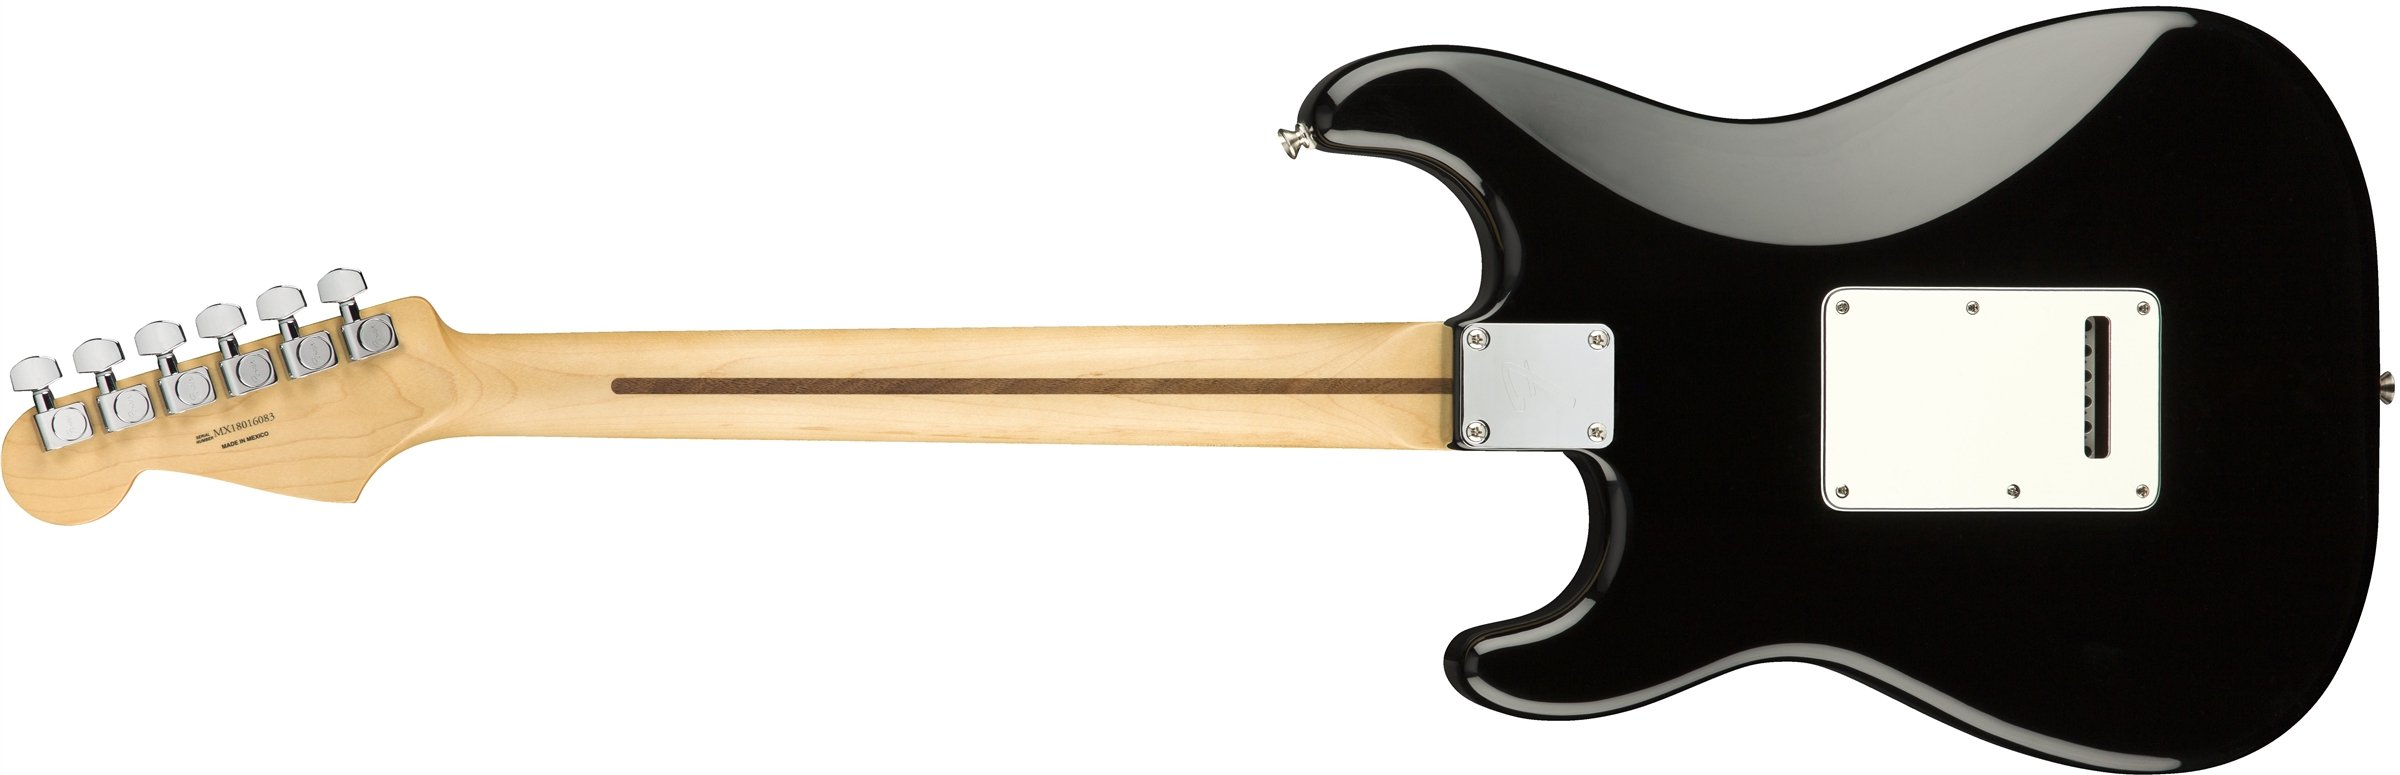 Fender Stratocaster Player–pF